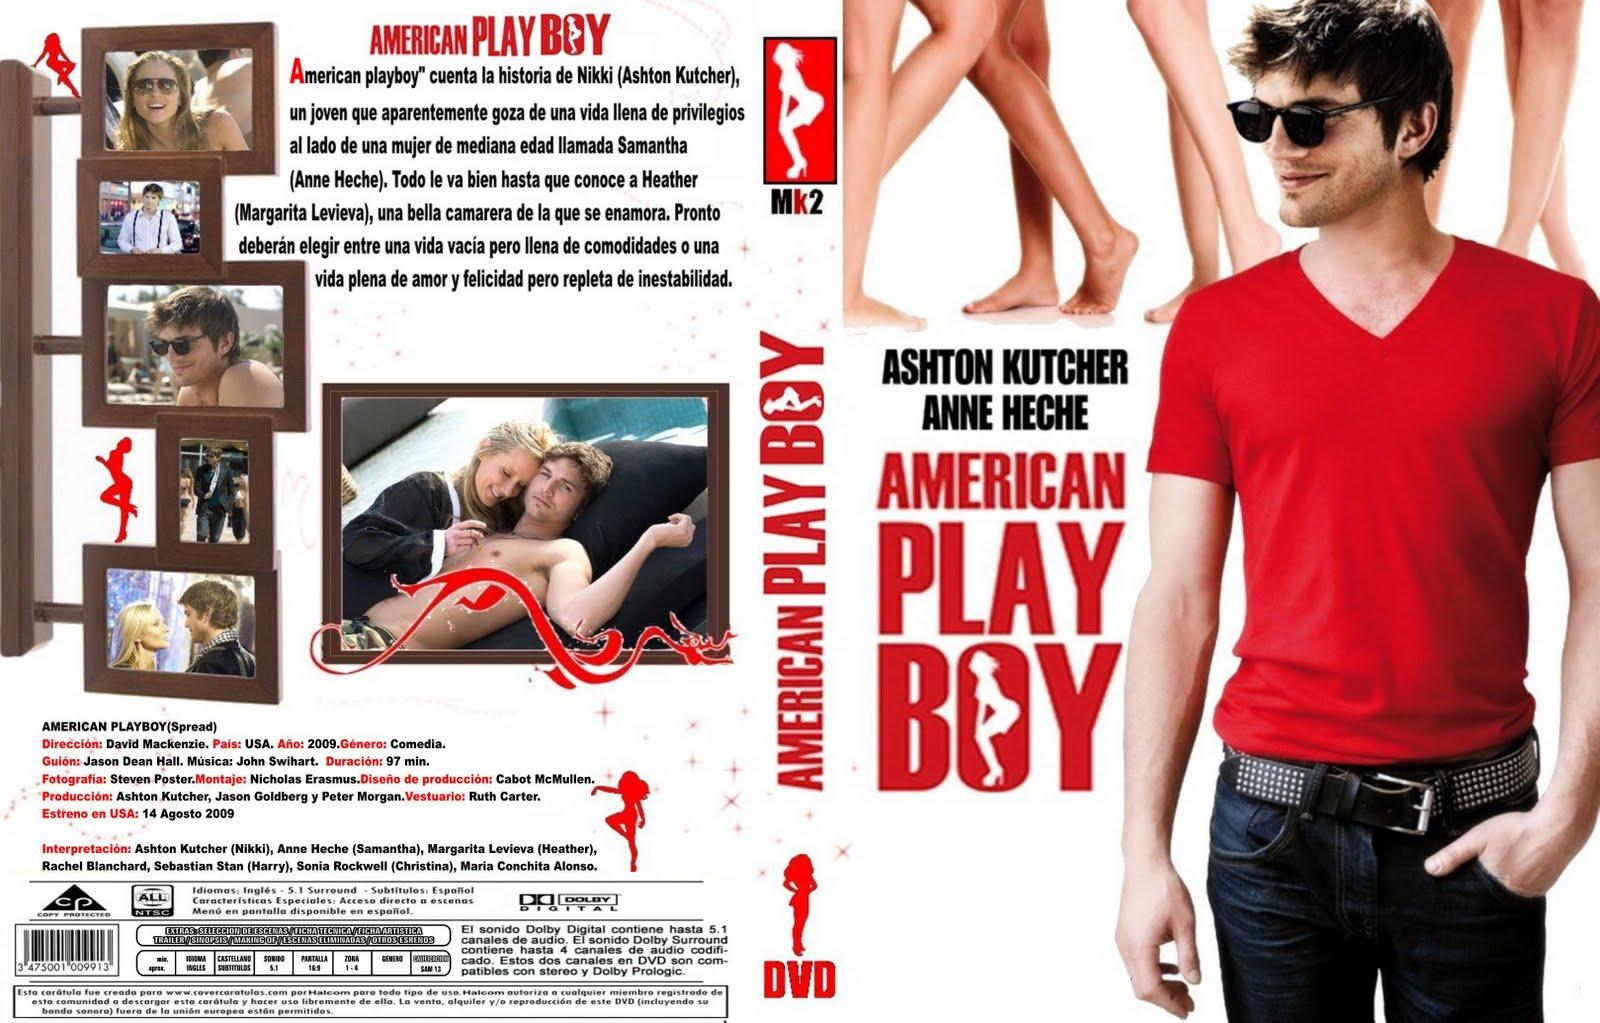 http://1.bp.blogspot.com/_NeMSesWOqnY/SwvVHSSK_NI/AAAAAAAAAXk/8ubKJShx0aE/s1600/AMERICAN+PLAYBOY.jpg